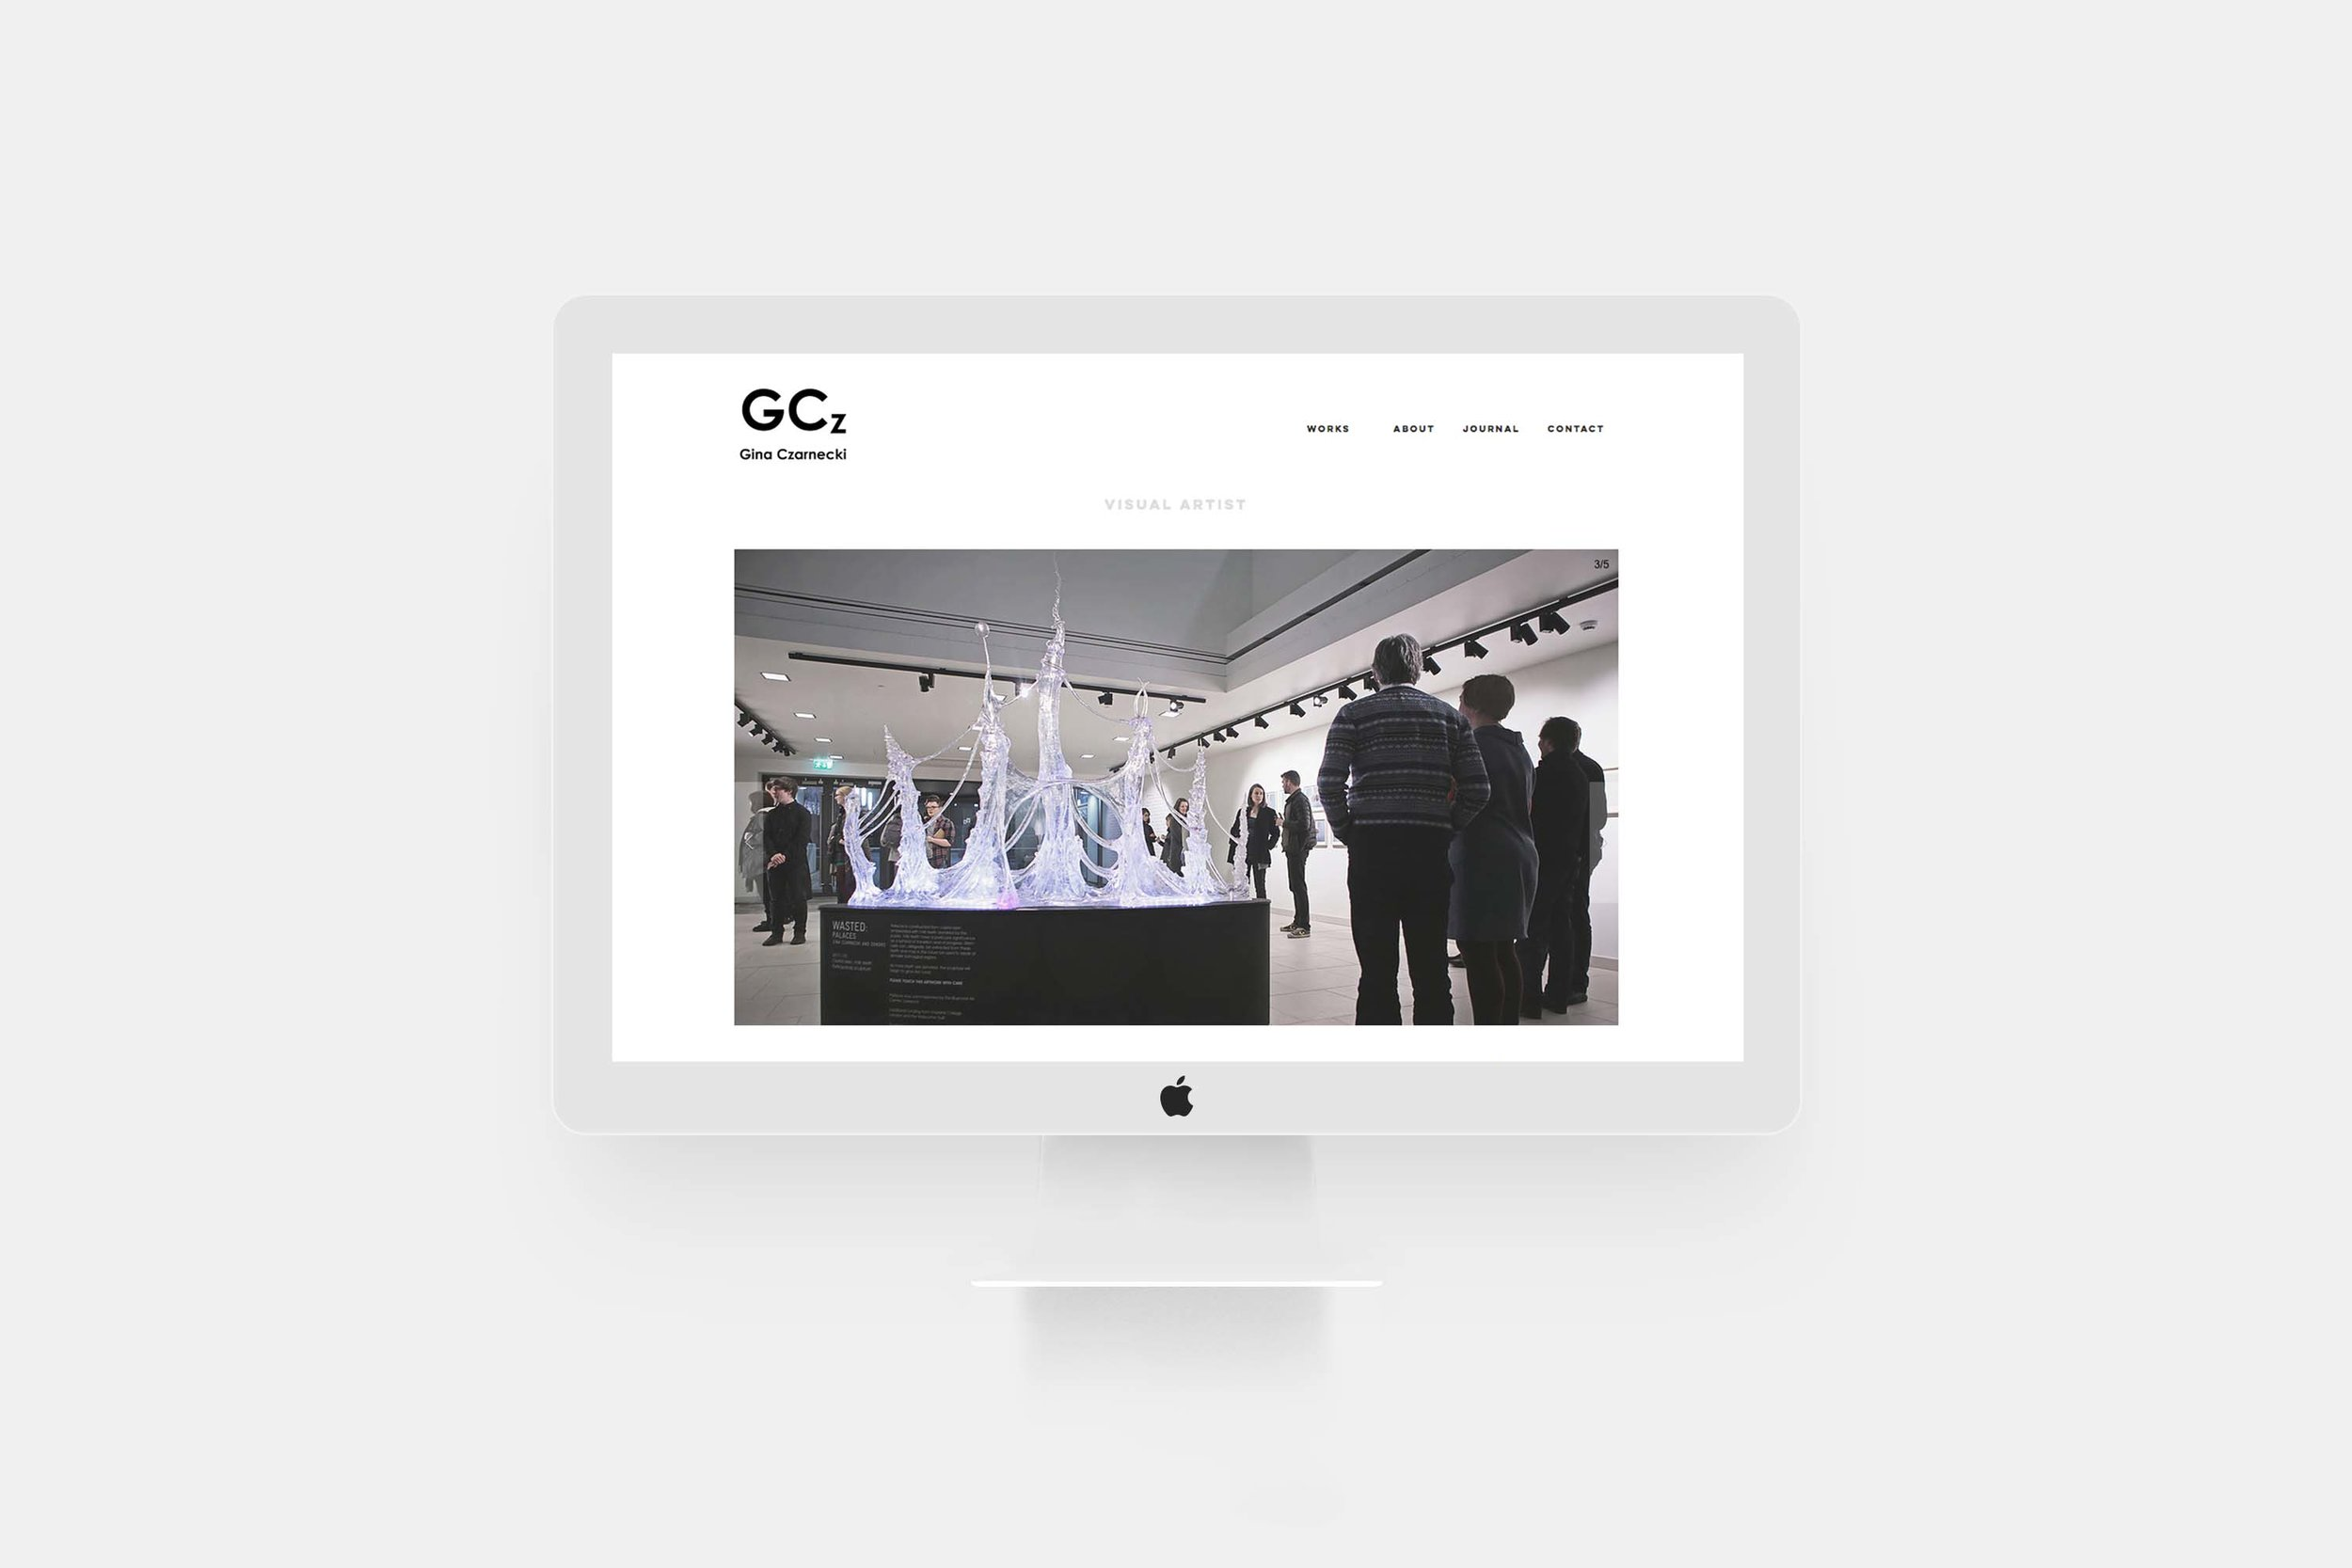 GCz - iMac - Home - Palace.jpg